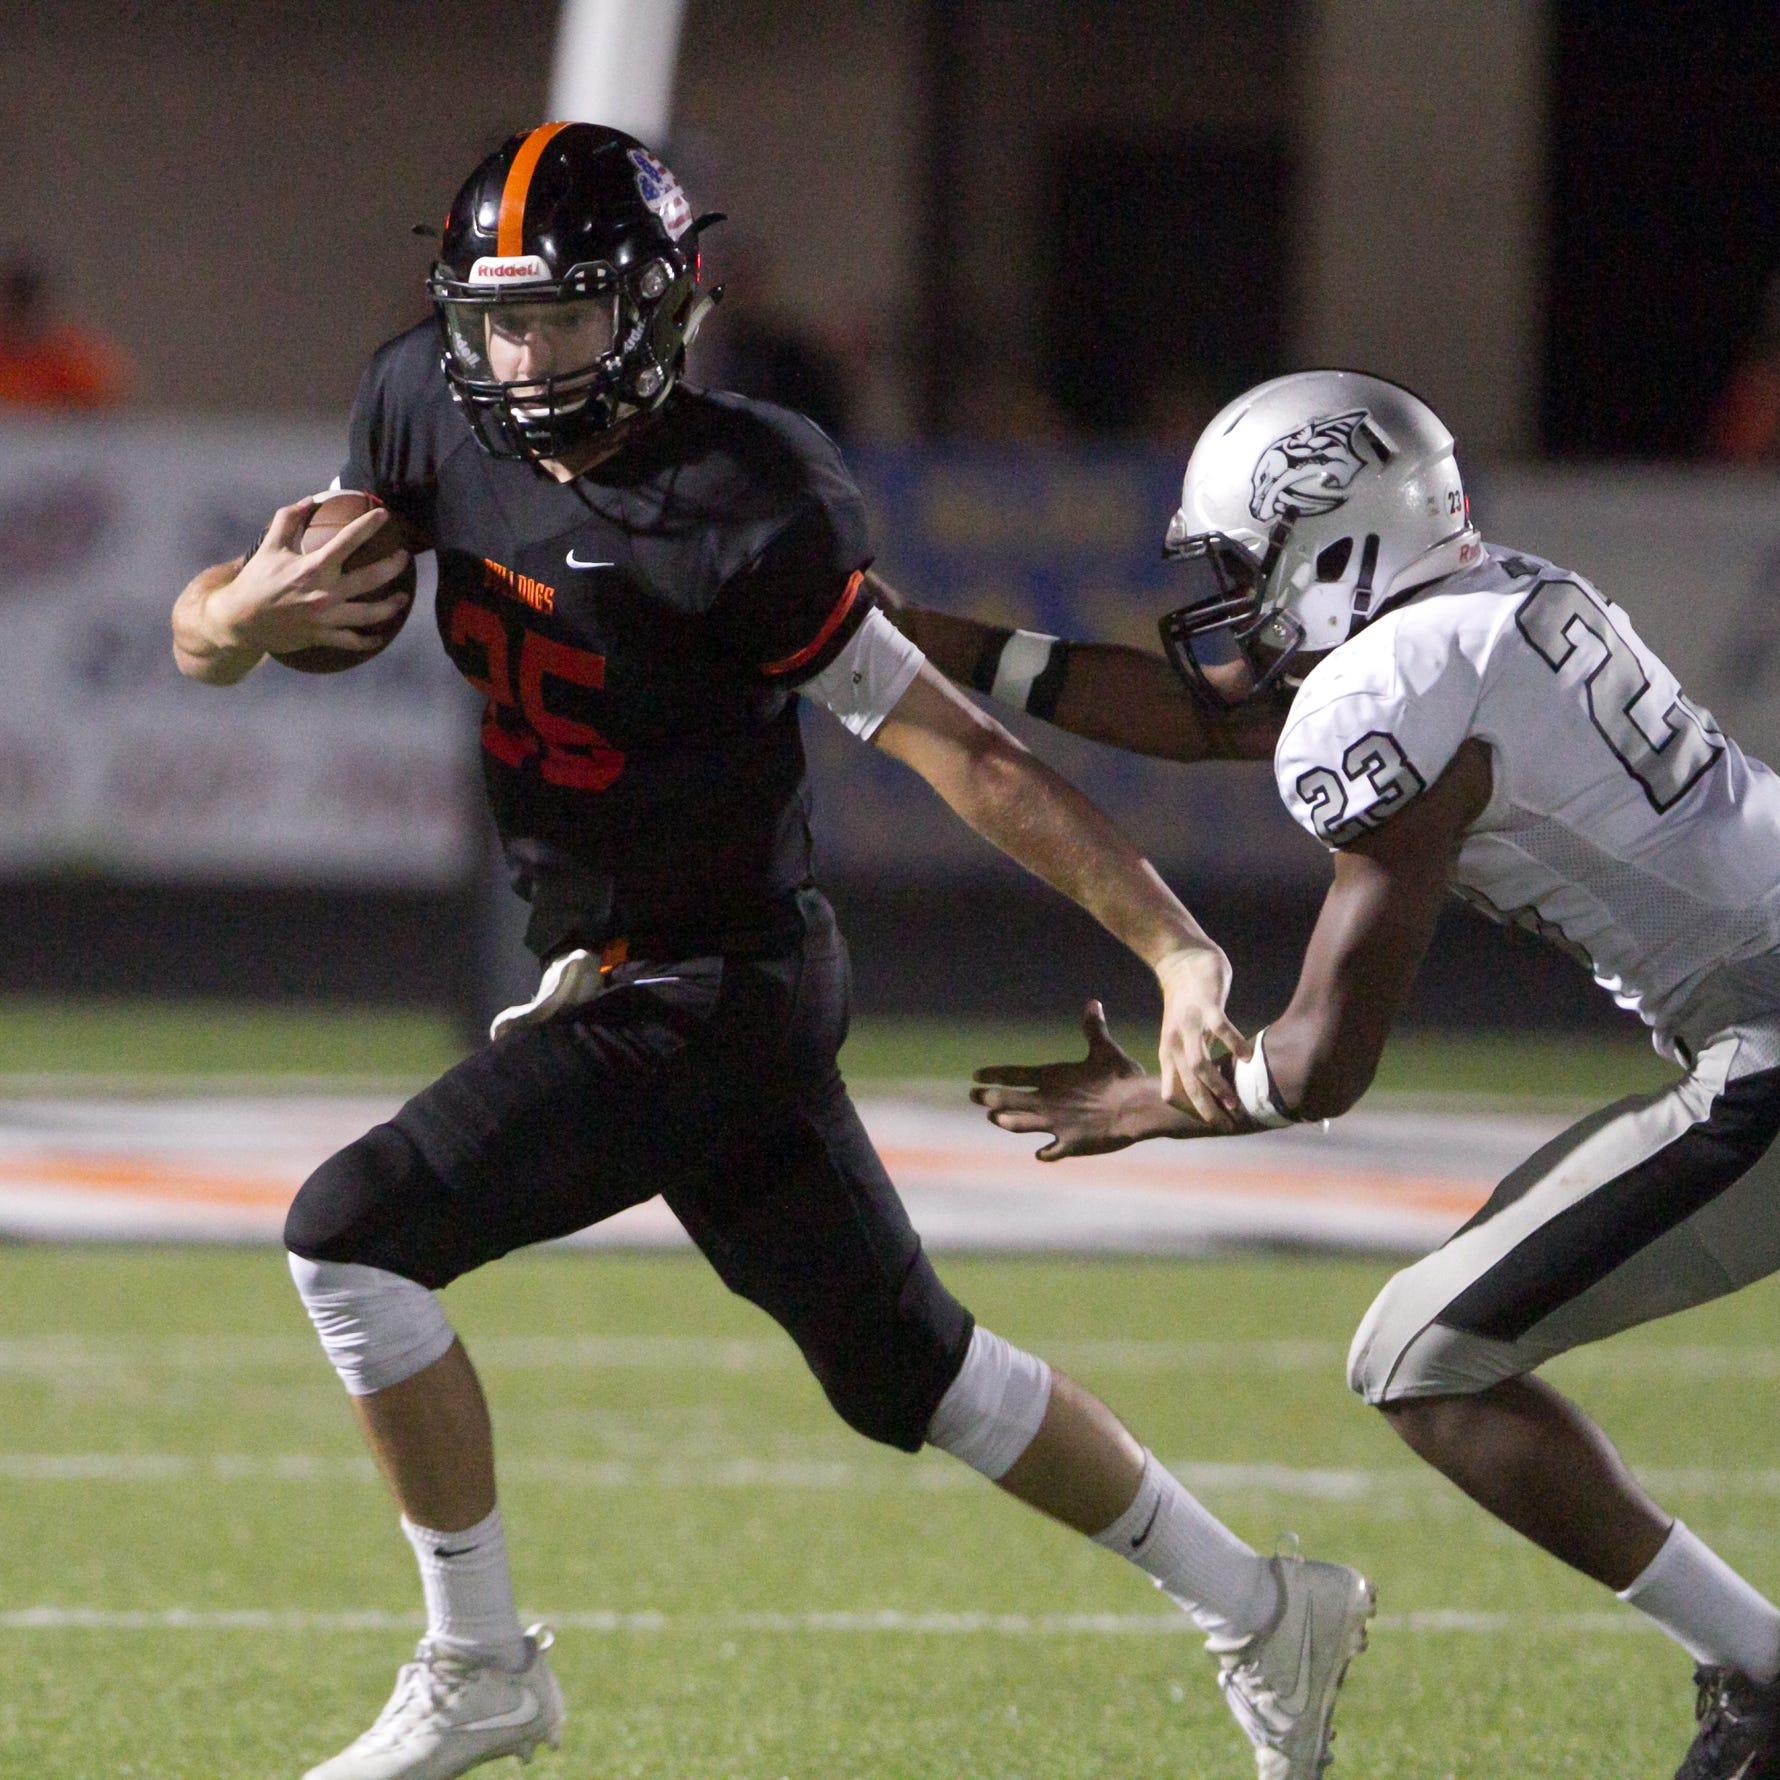 Livingston County high school football scores for Week 4